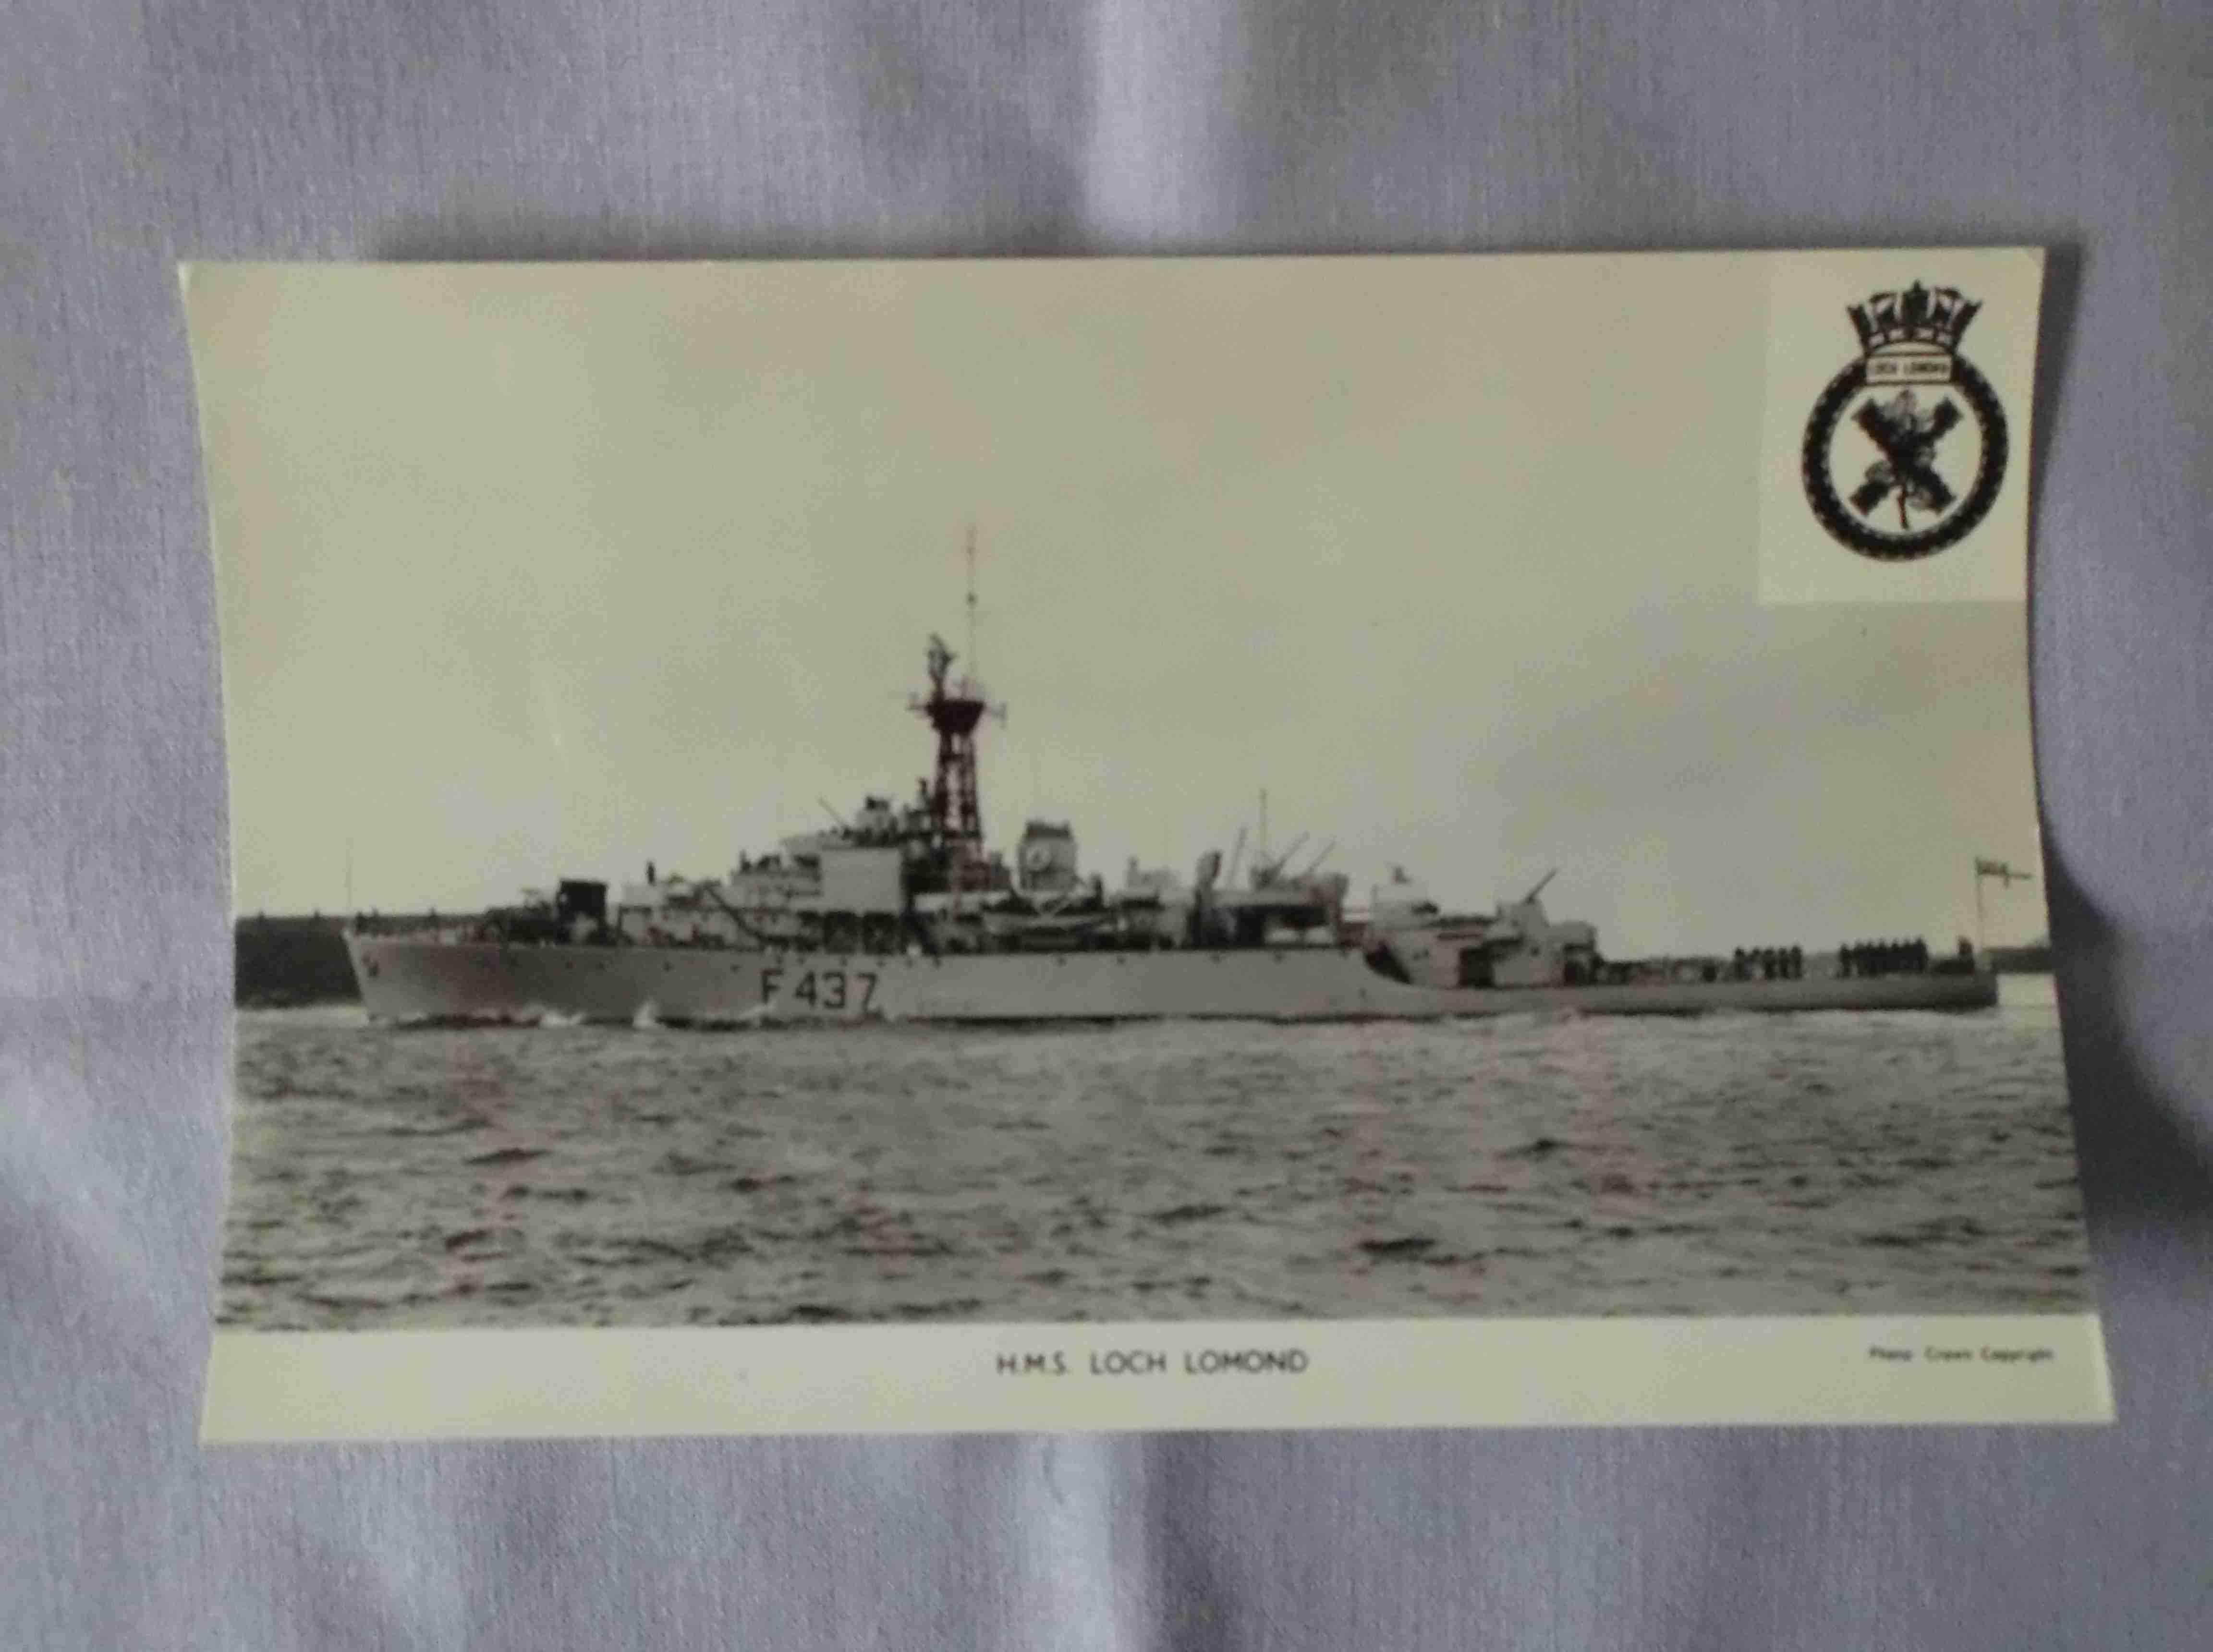 POSTCARD SIZE PHOTOGRAPH OF THE ROYAL NAVAL VESSEL HMS LOCHLOMOND